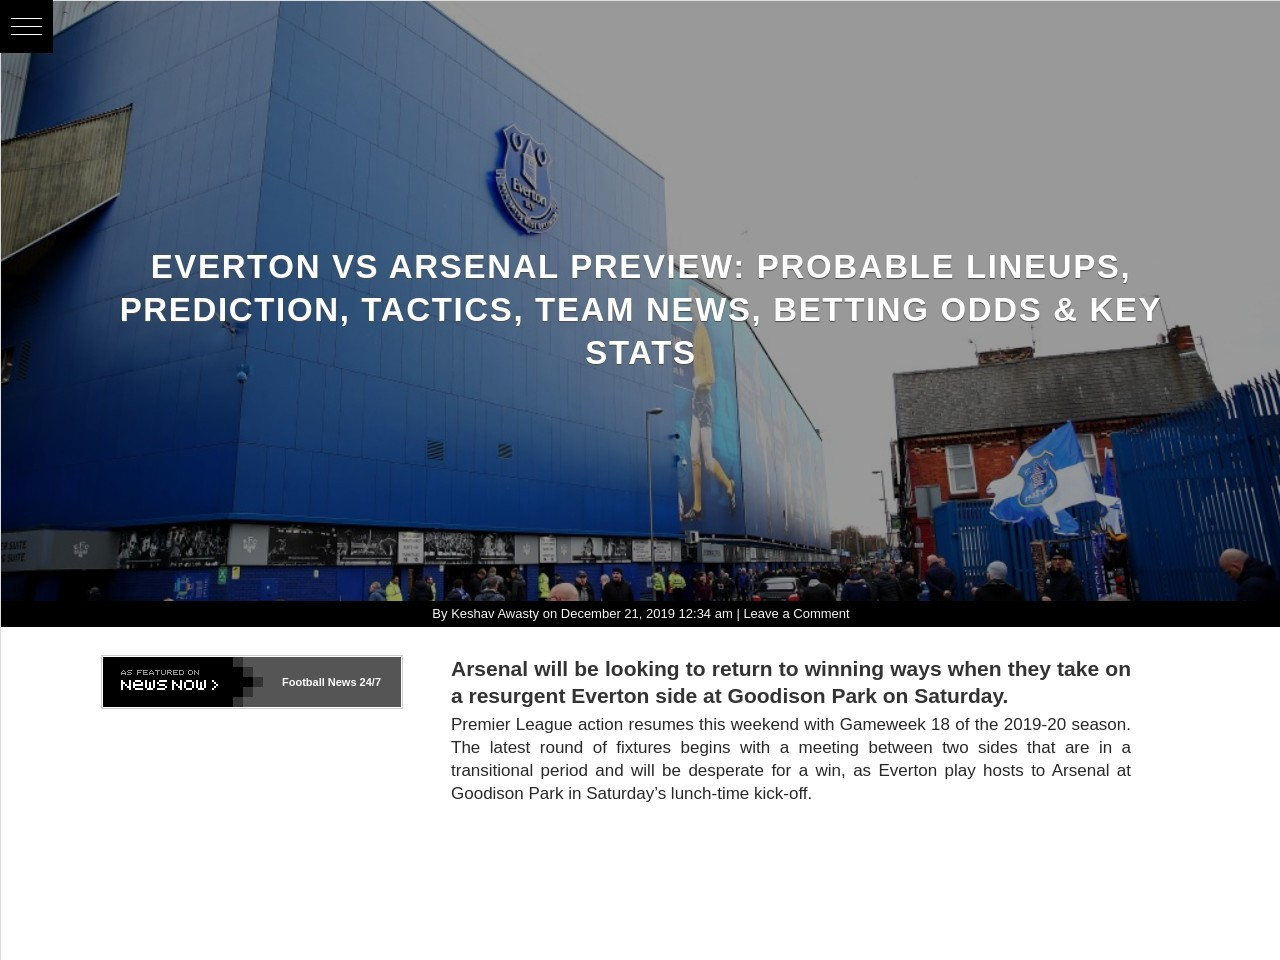 Everton vs Arsenal Preview: Probable Lineups, Prediction, Tactics…